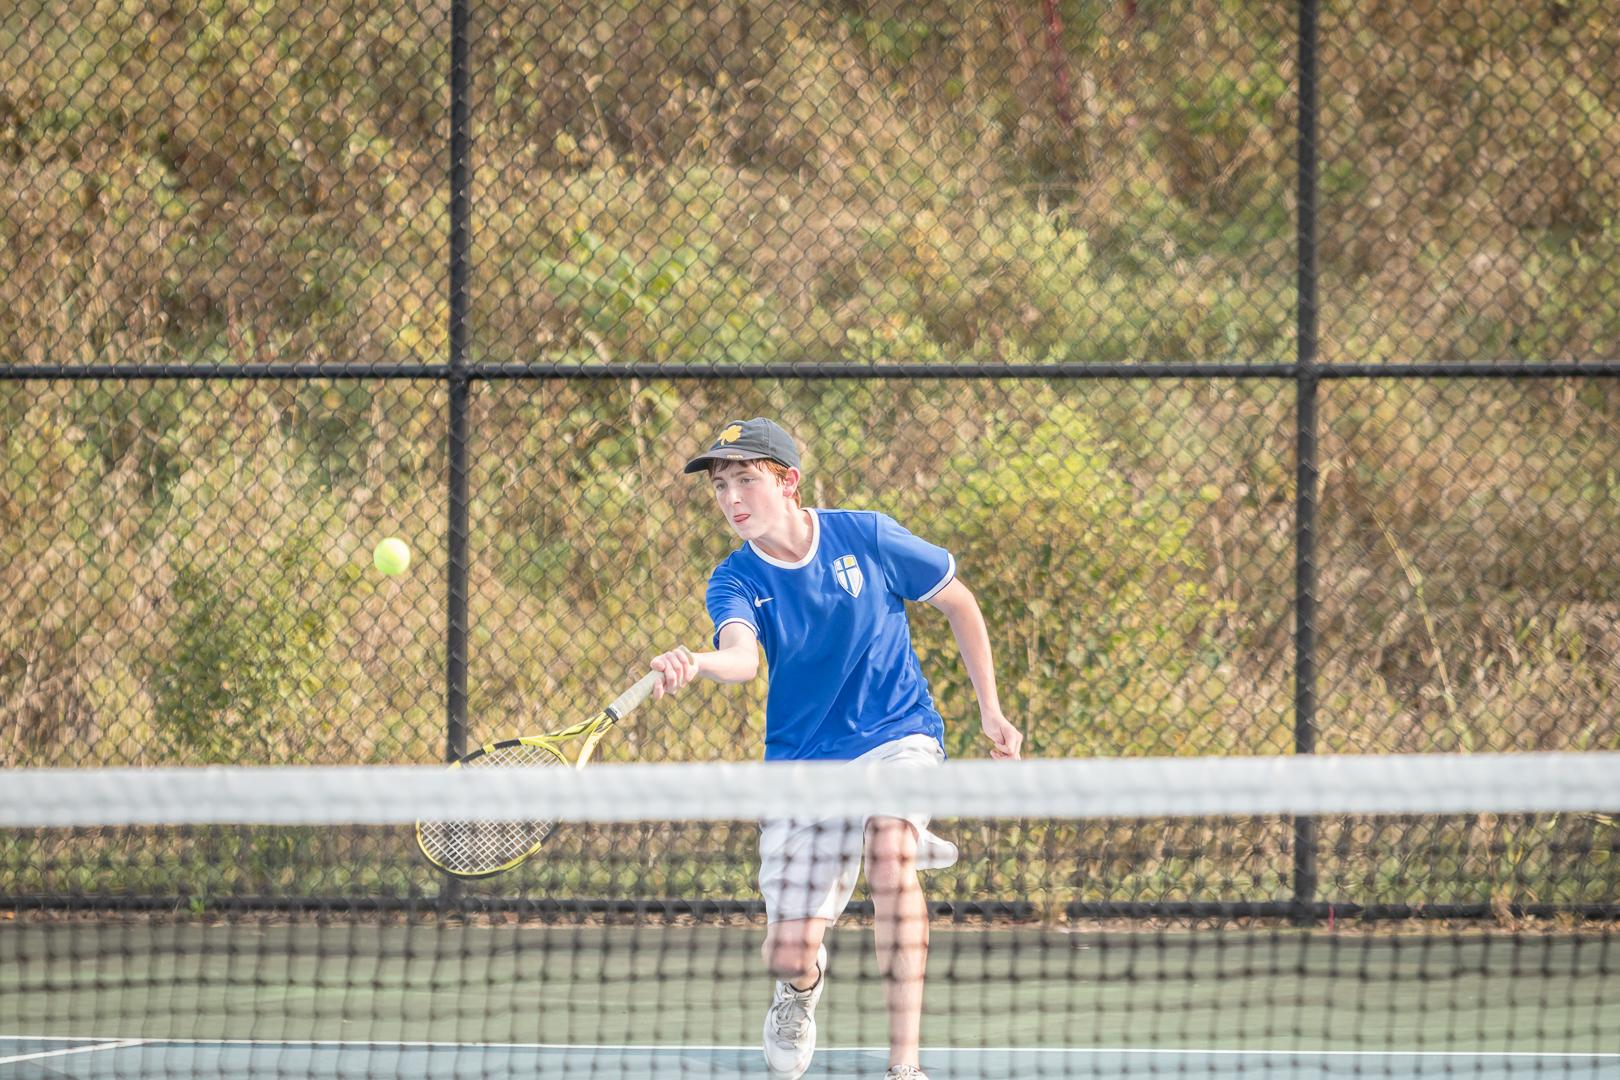 Marian-Boys-Tennis-1716.jpg